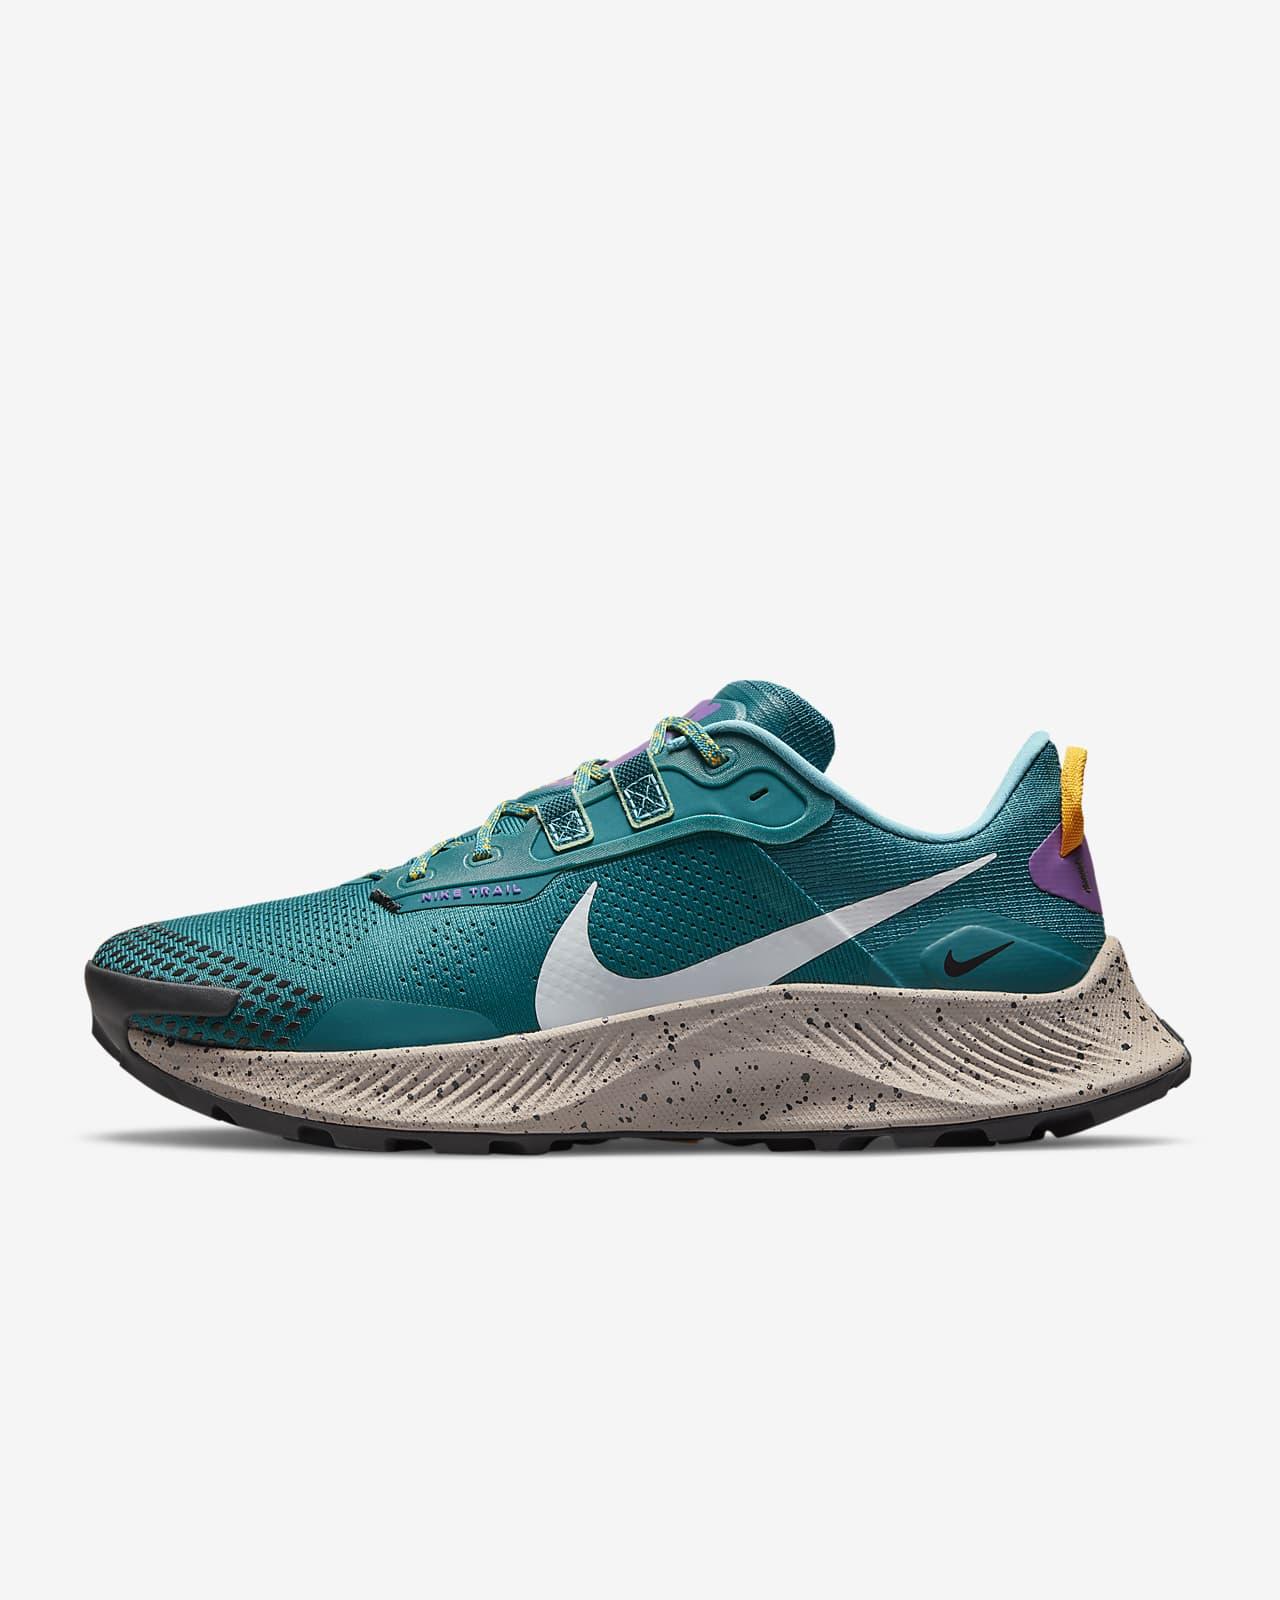 Sapatilhas de running para trilhos Nike Pegasus Trail 3 para homem